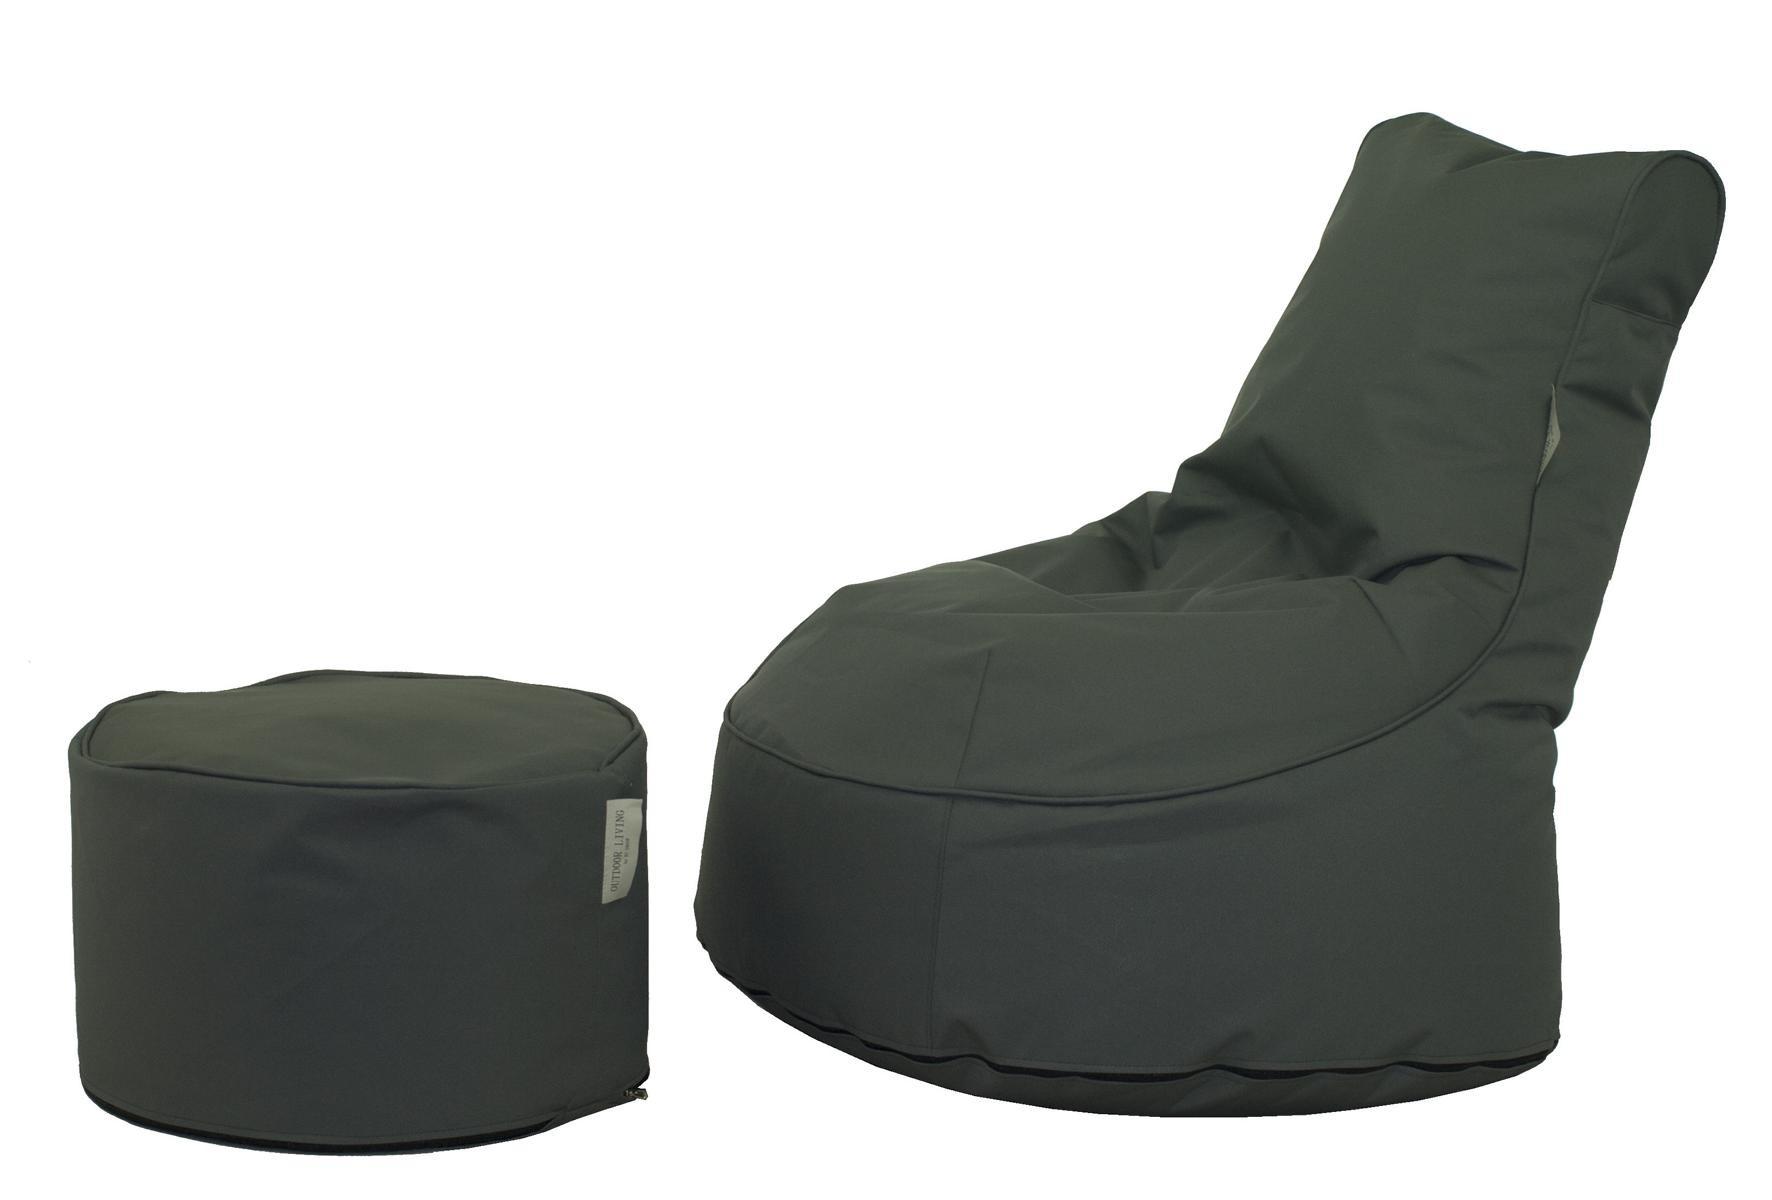 2tlg Outdoor Sitzsack Set Mod Outdoorcomfortandpoufmiami Grau